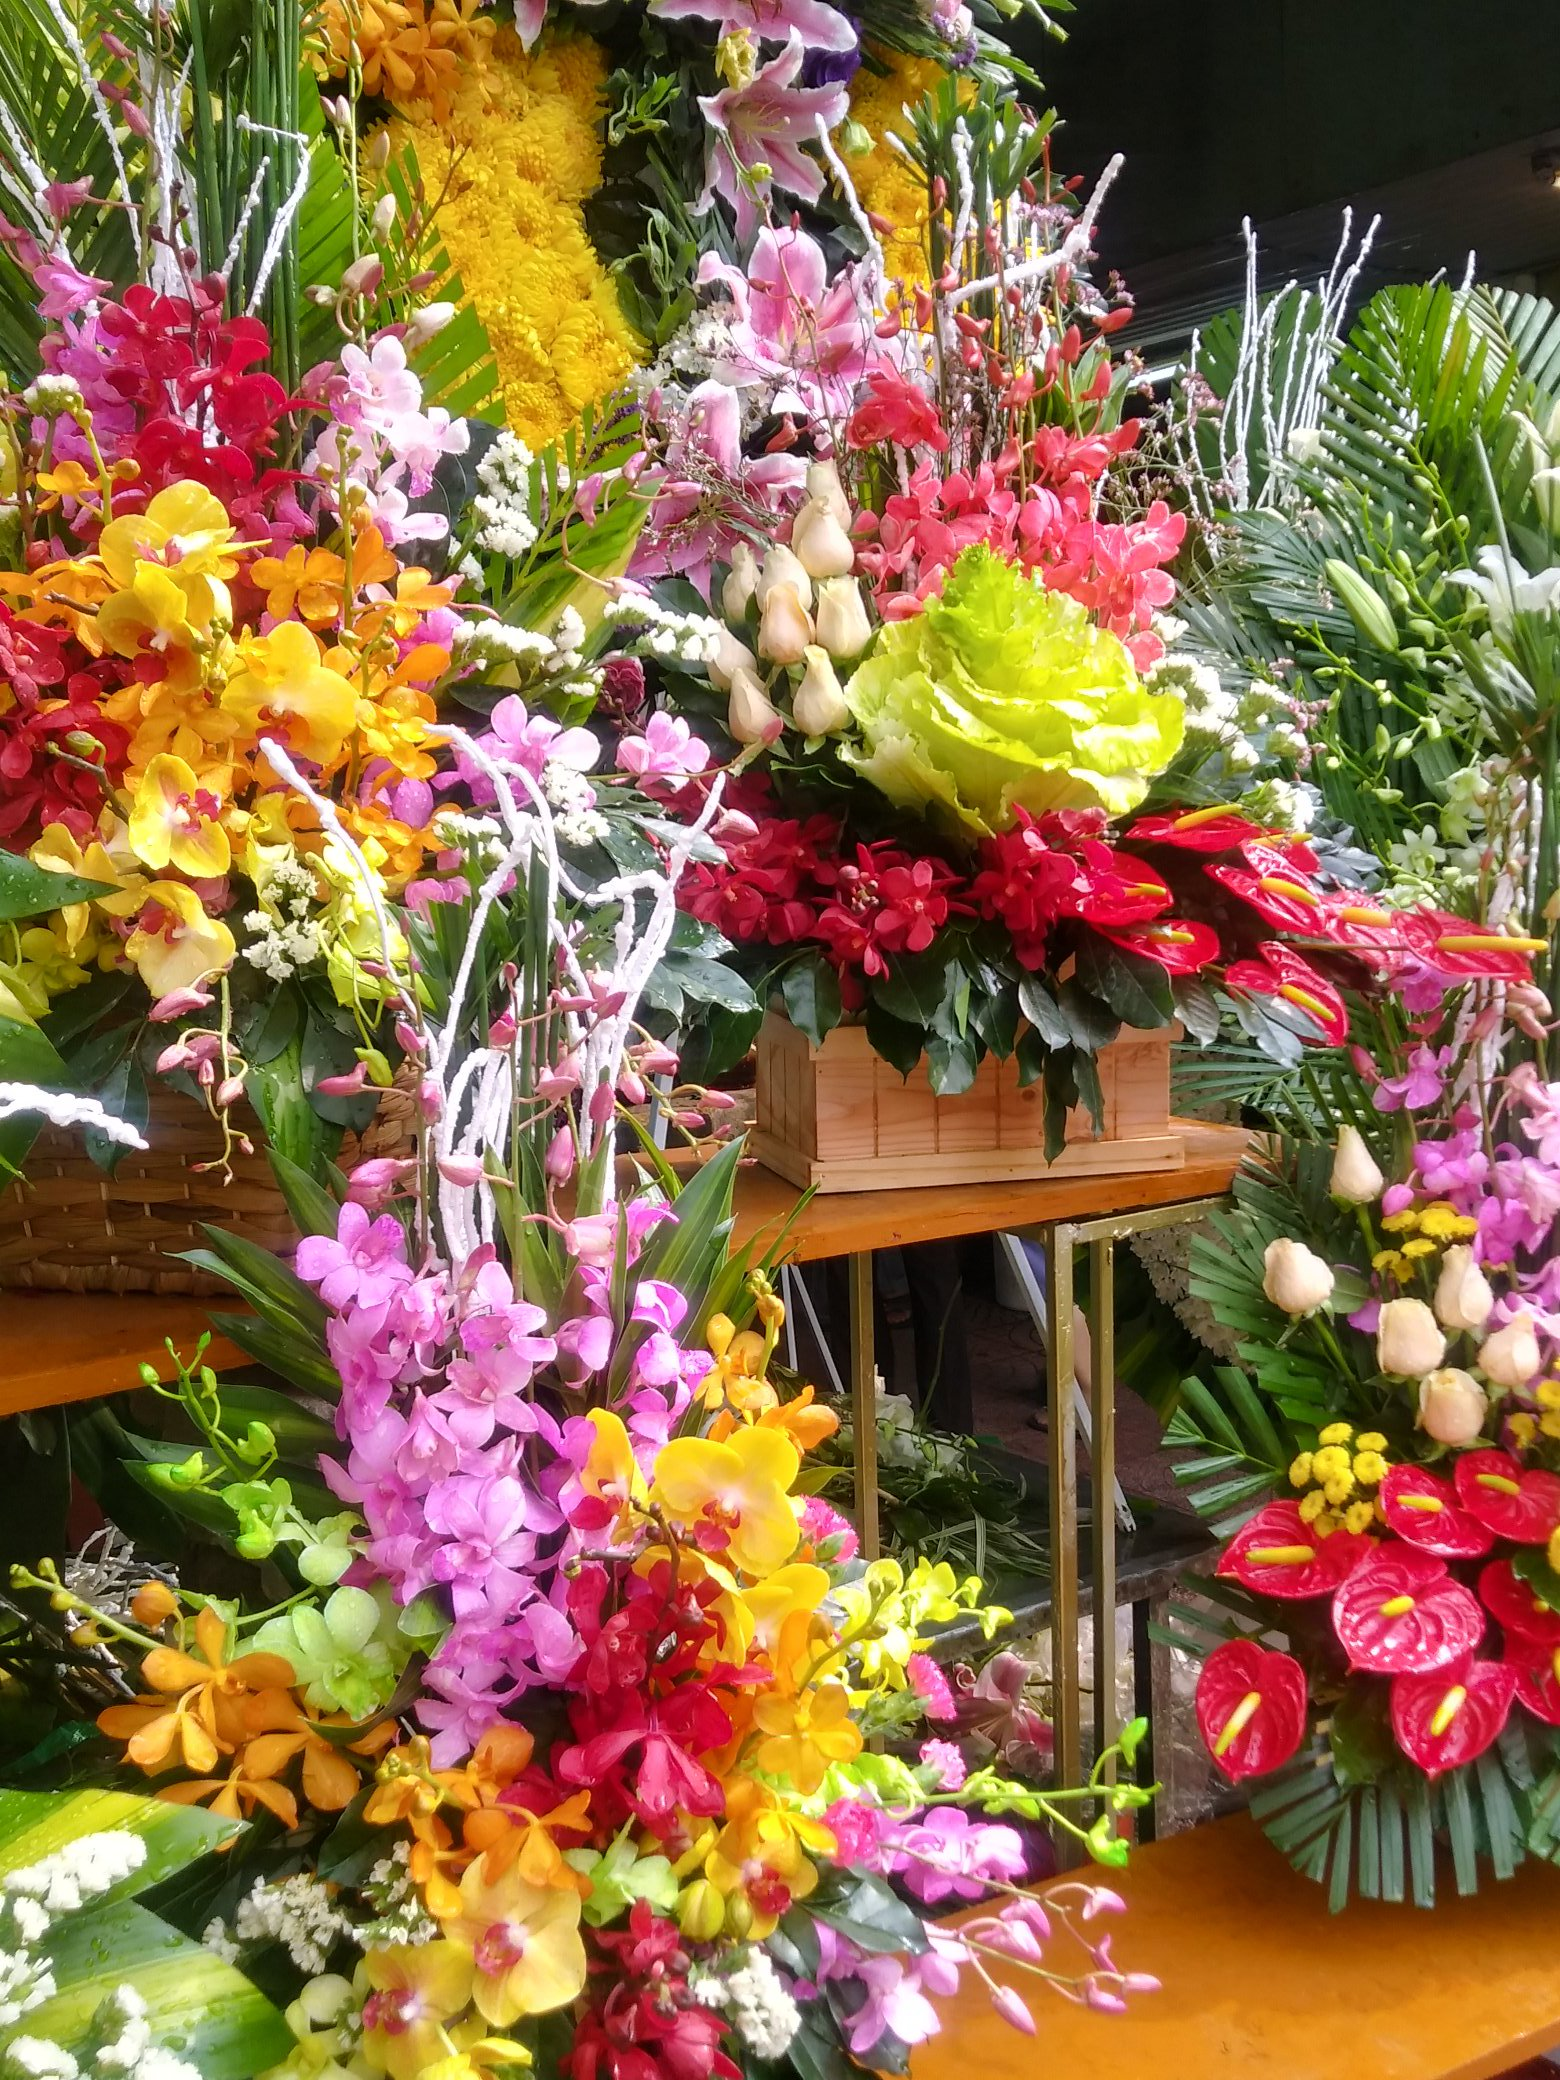 An abundance of orchids, everywhere